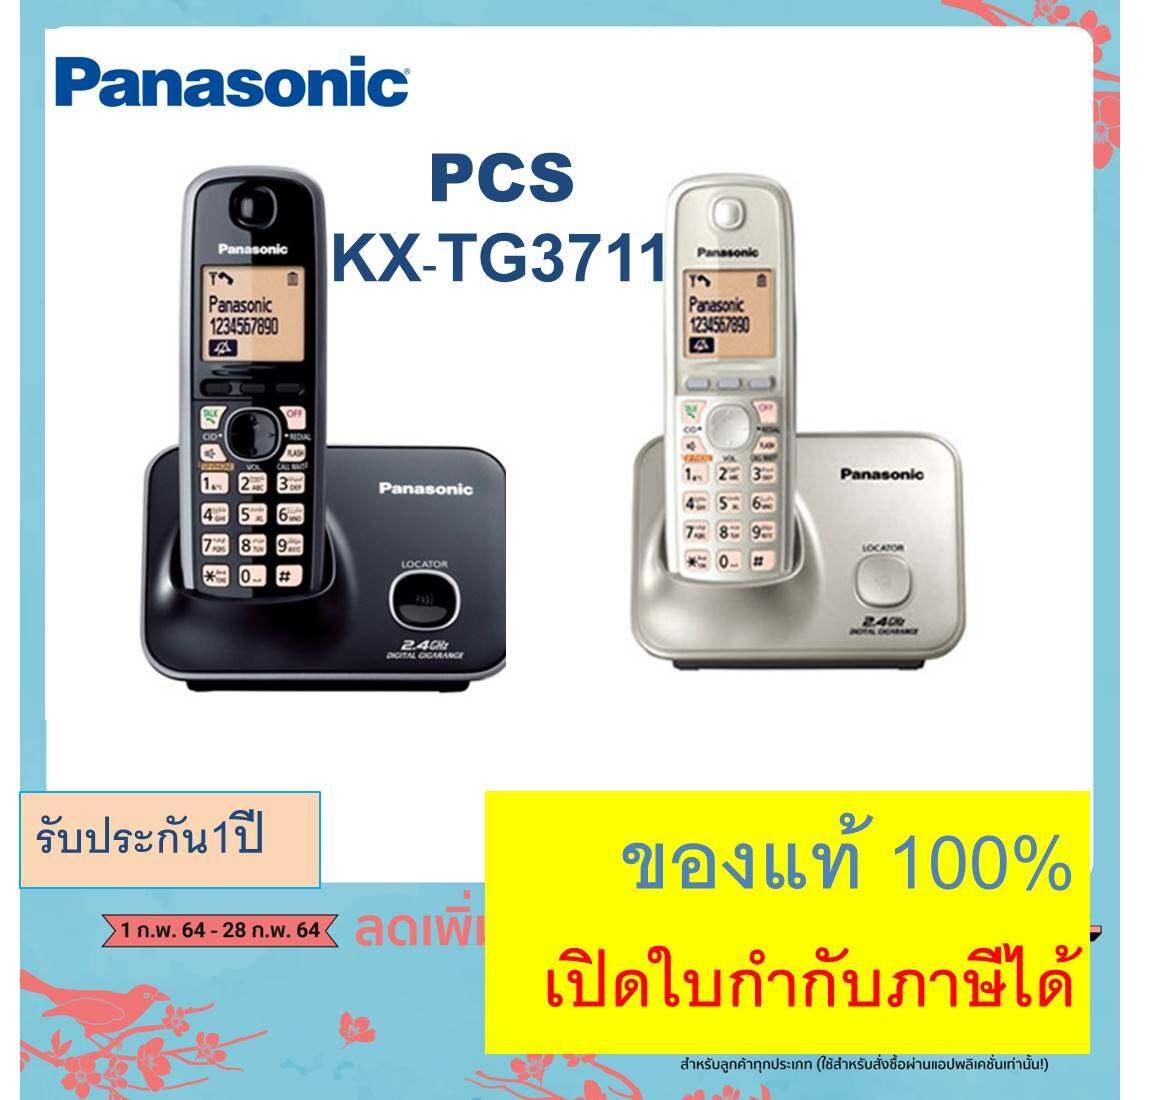 Panasonic เครื่องโทรศัพท์ไร้สาย 2.4ghz สีดำ/เงิน รุ่น Kx-Tg3711 Cordless Phone ราคาถูก โทรศัพท์บ้านแบบไร้สาย โทรศัพท์บ้าน ออฟฟิศ สำนักงาน ใช้ร่วมกับตู้.